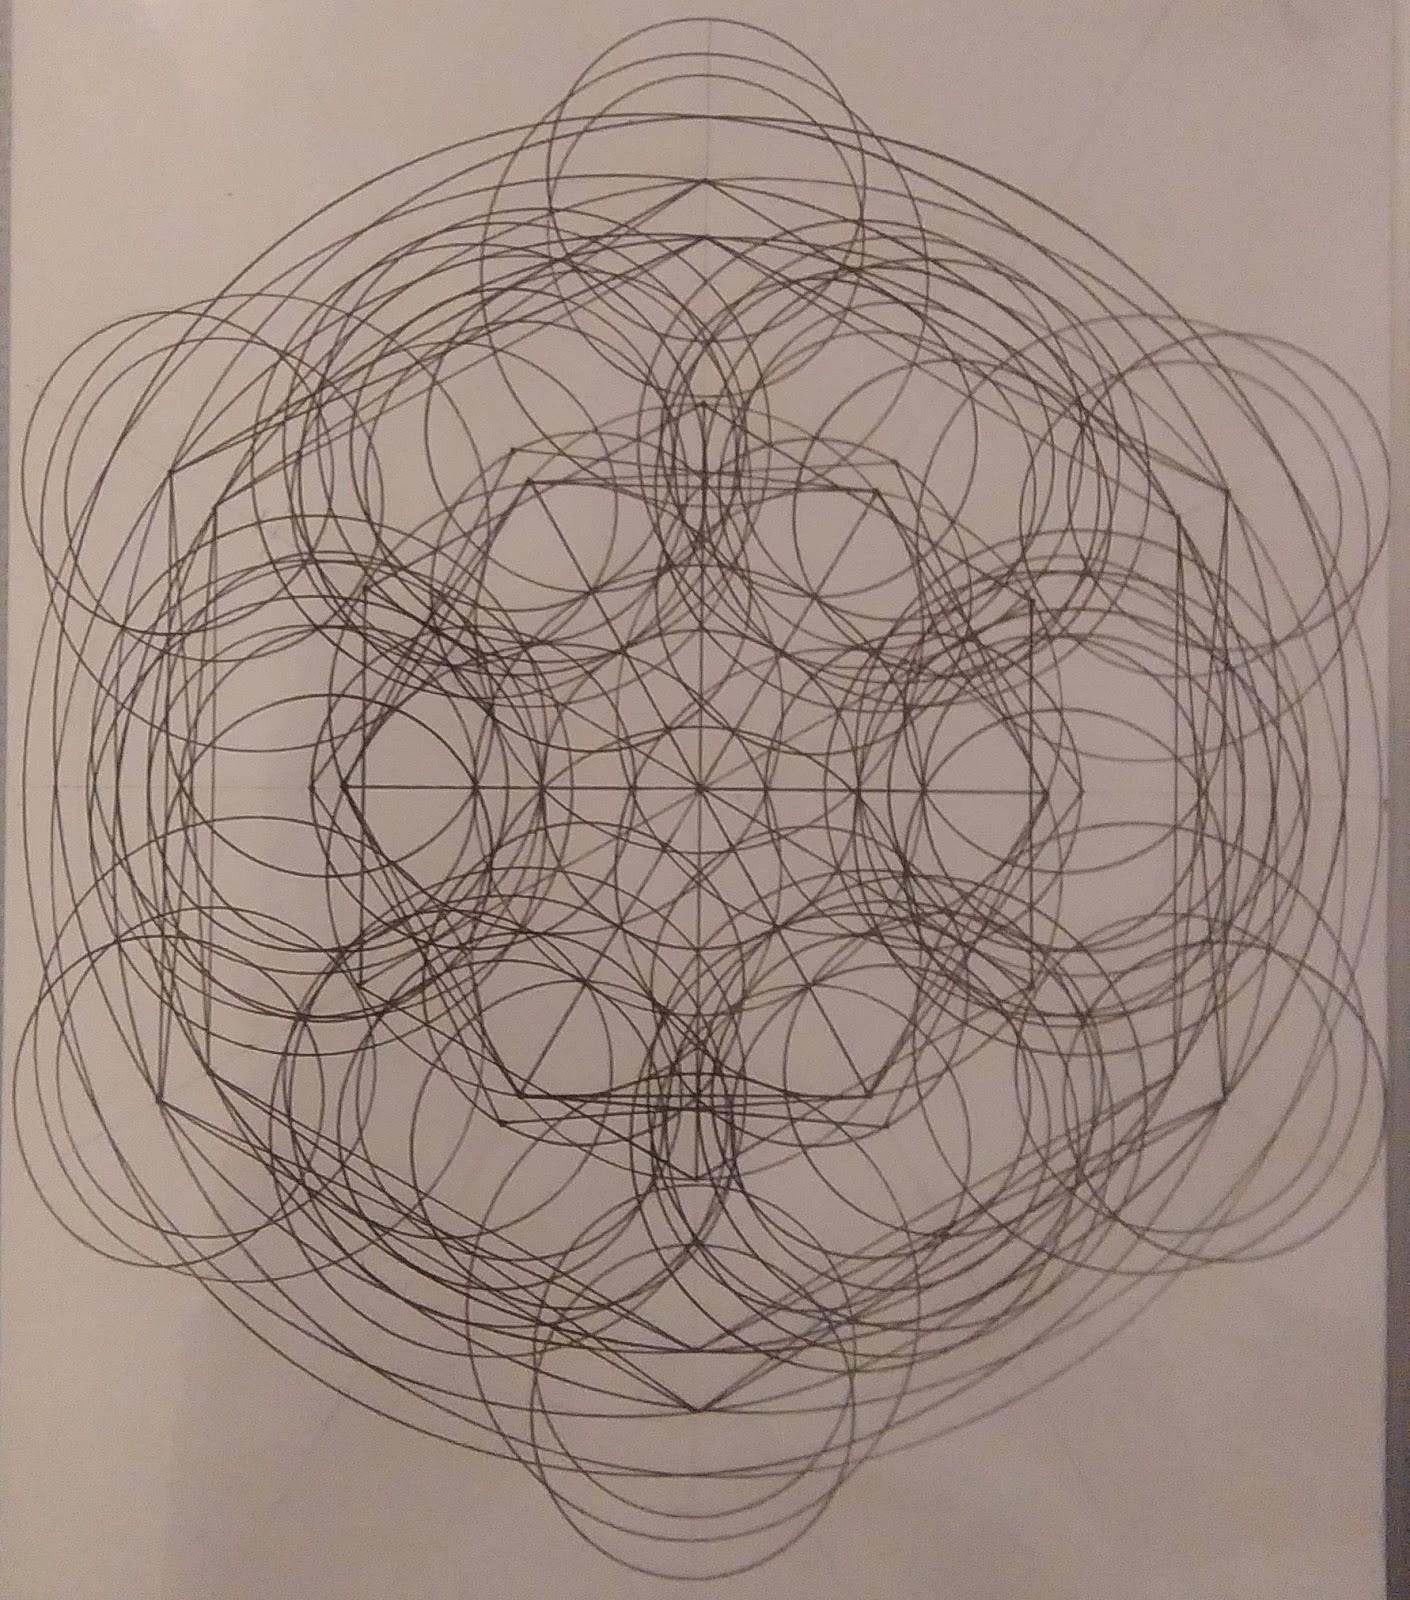 [SPOLYK] - Geometries & sketches - Page 6 47688835_1103195673200449_4913562772693843968_o